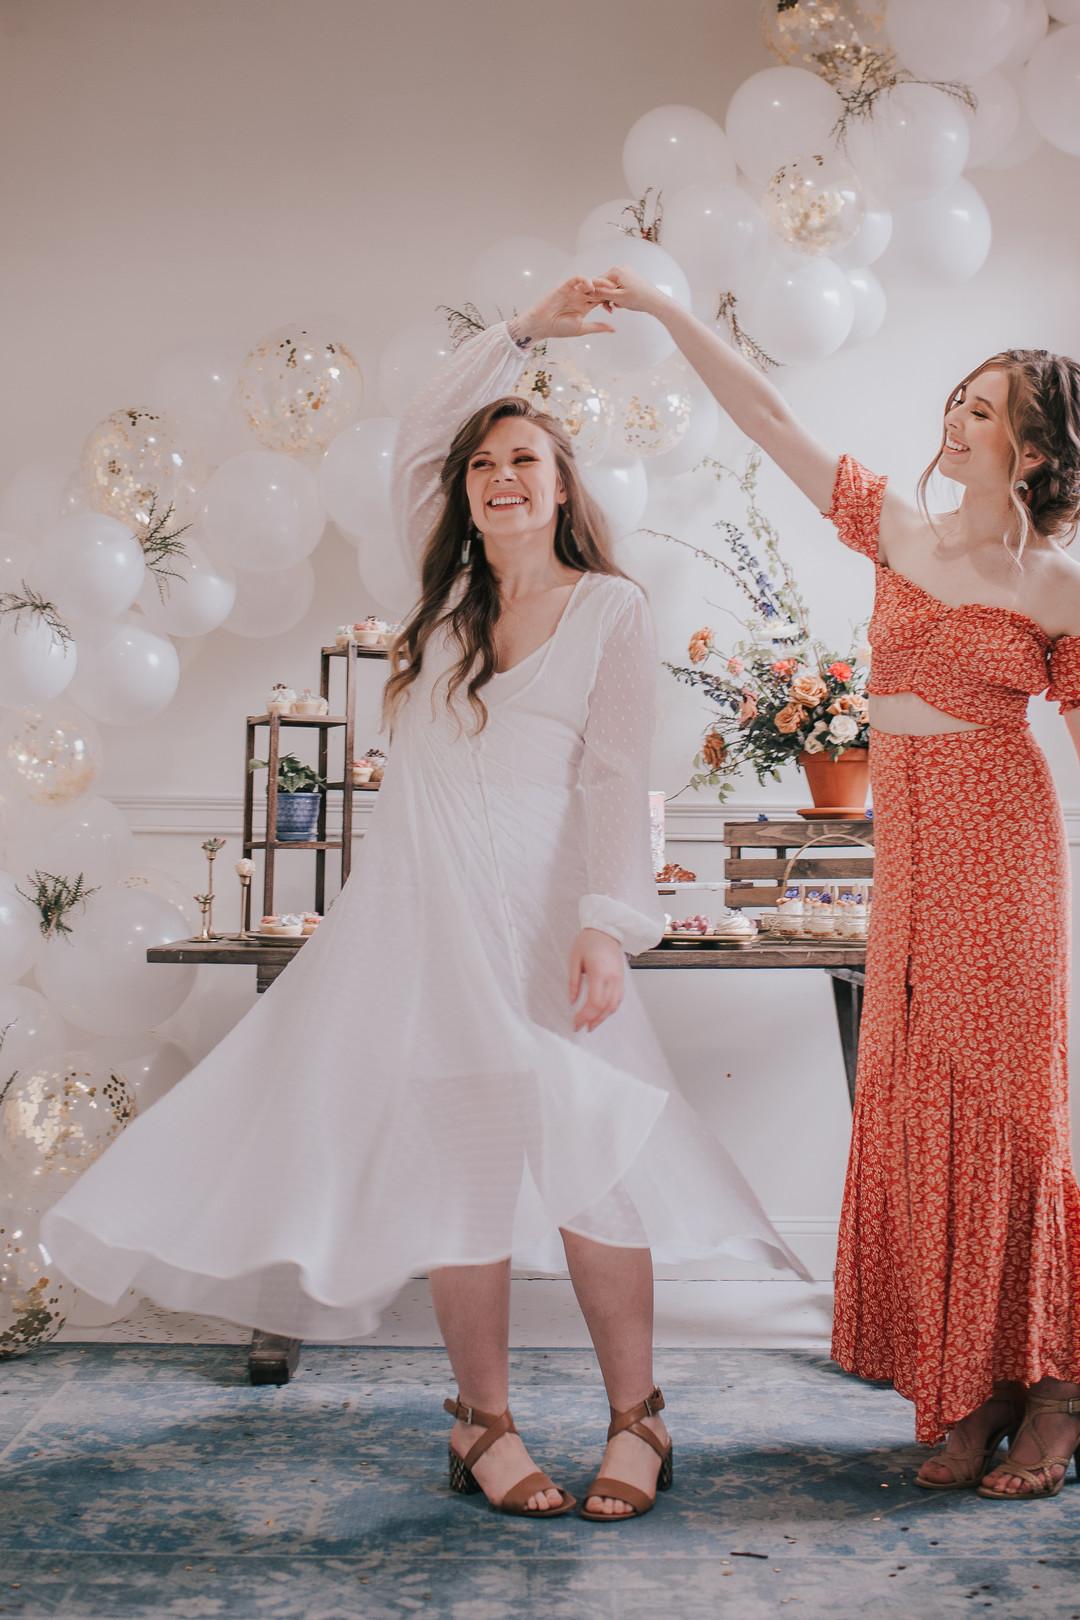 Bridal Shower Styled Shoot